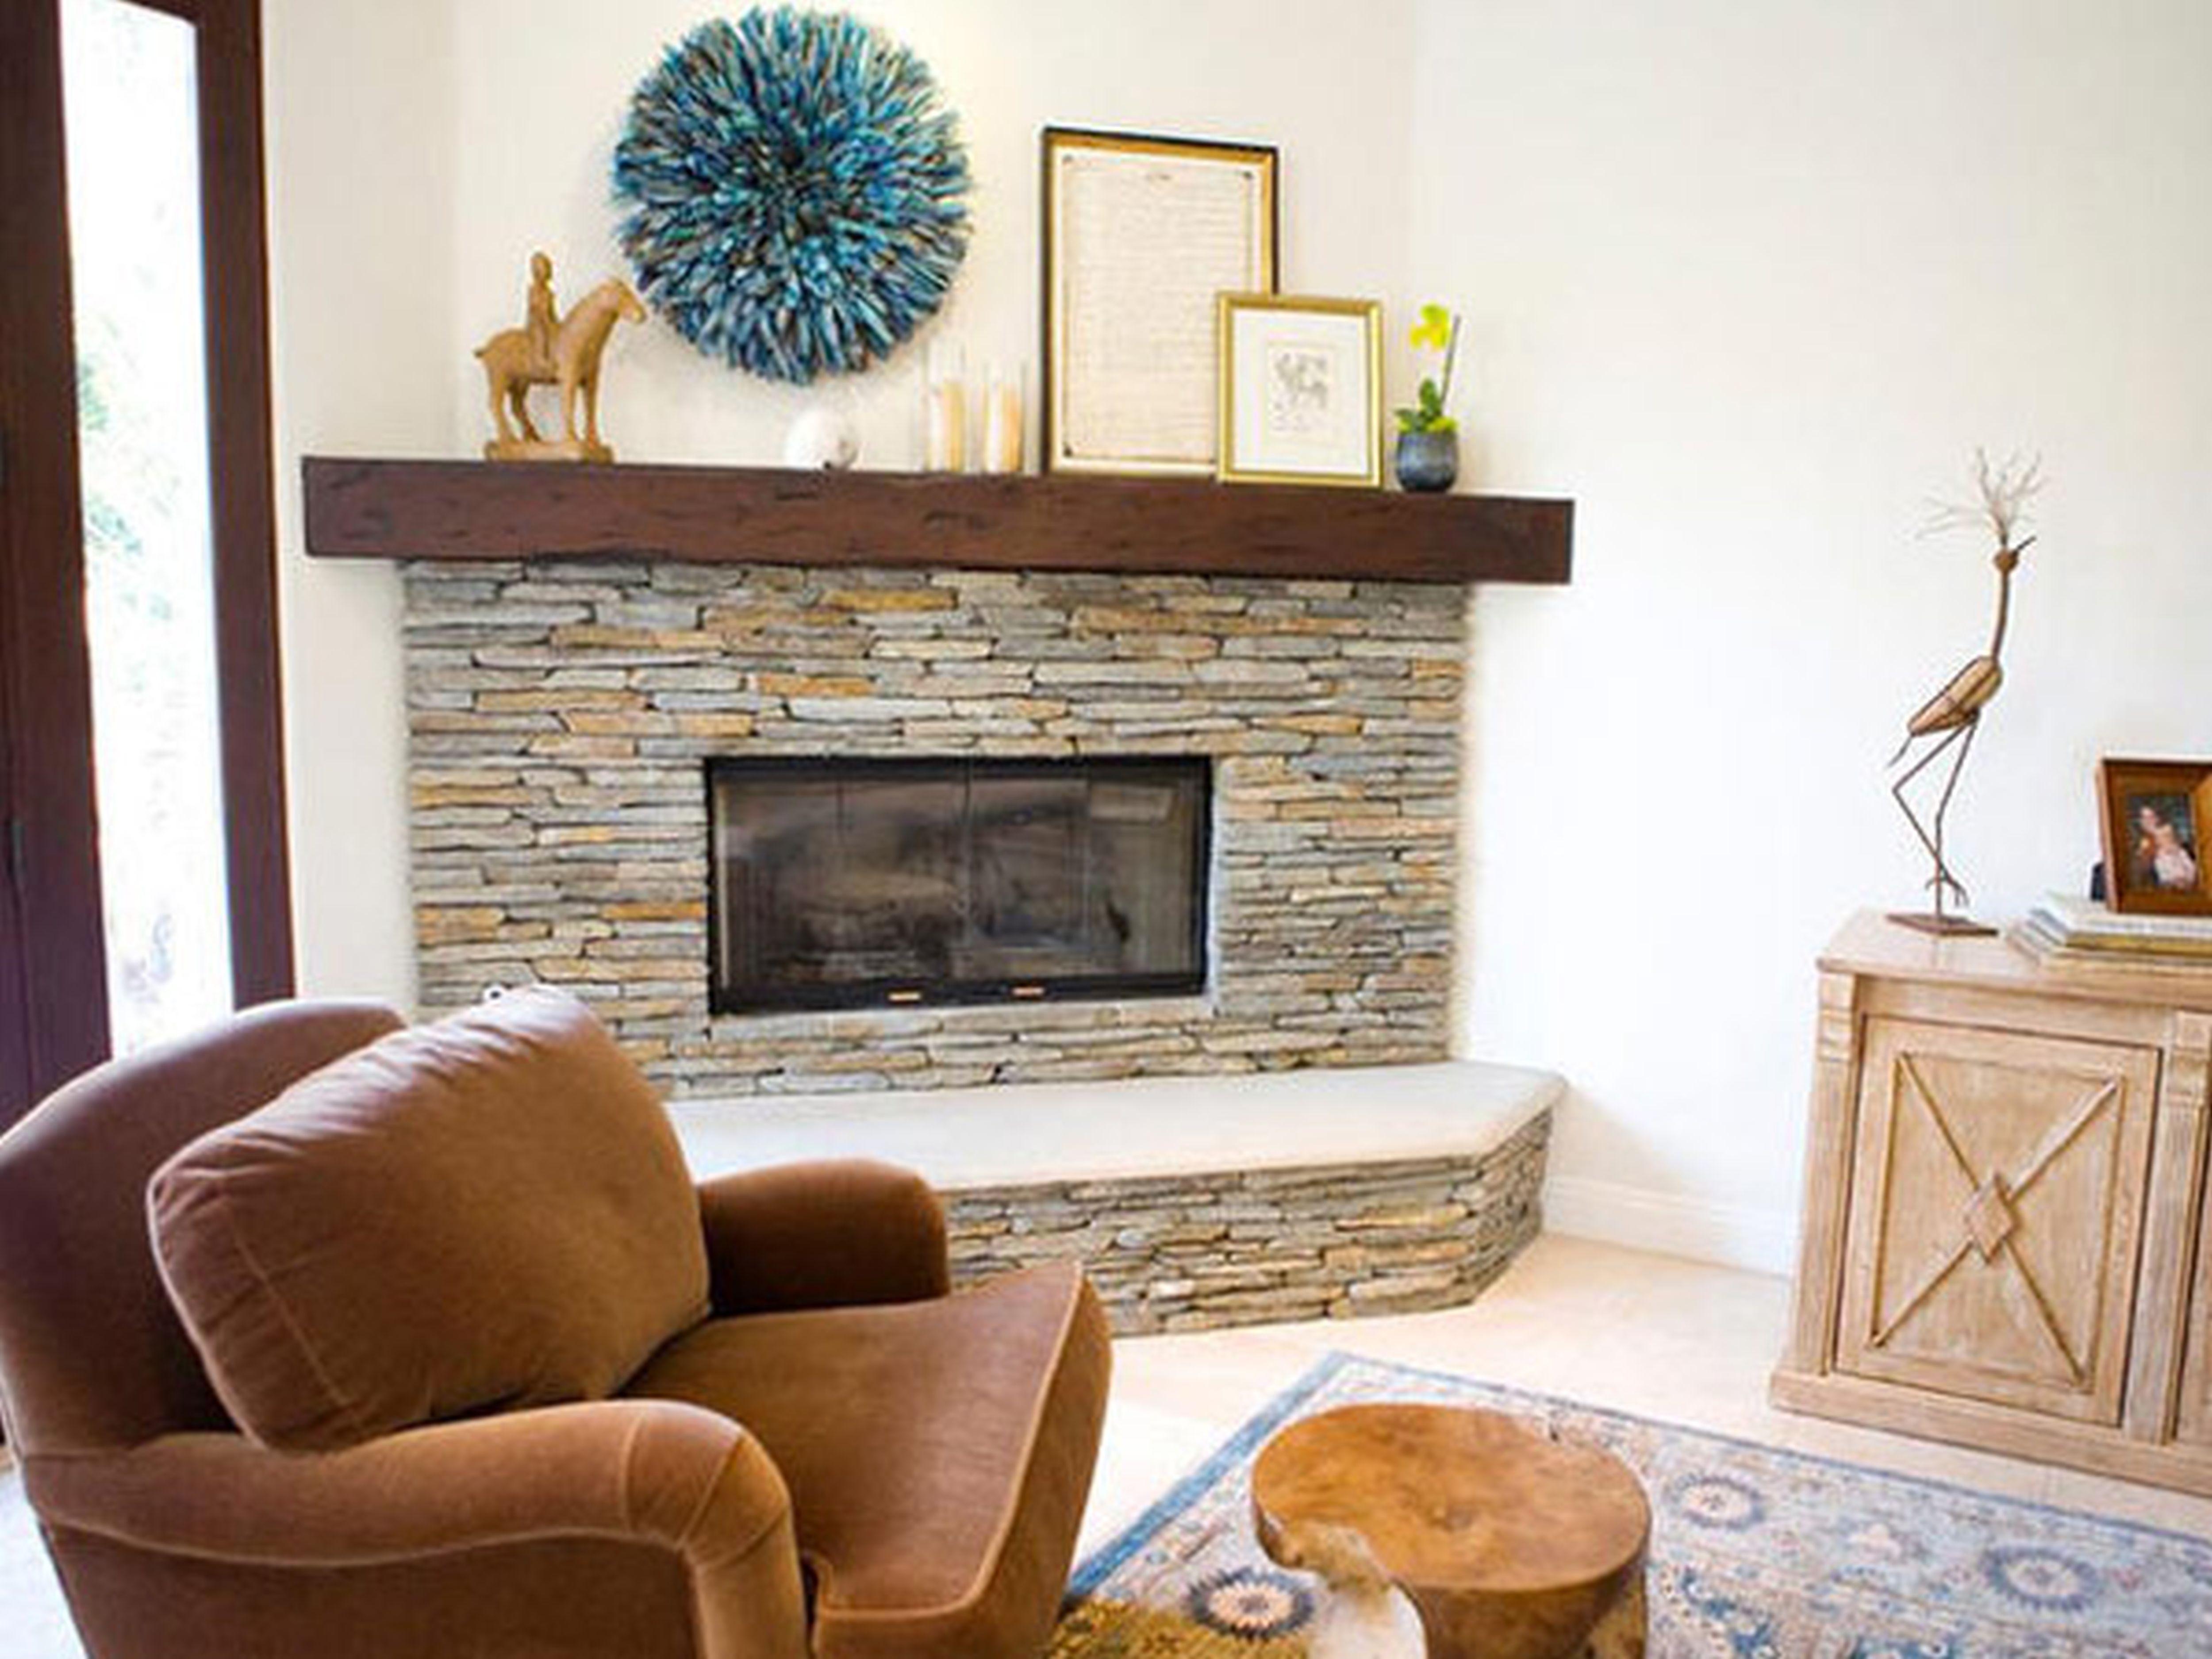 Amazing Fireplace Mantel Design E2 80 94 Home Color Ideas Image Of ...